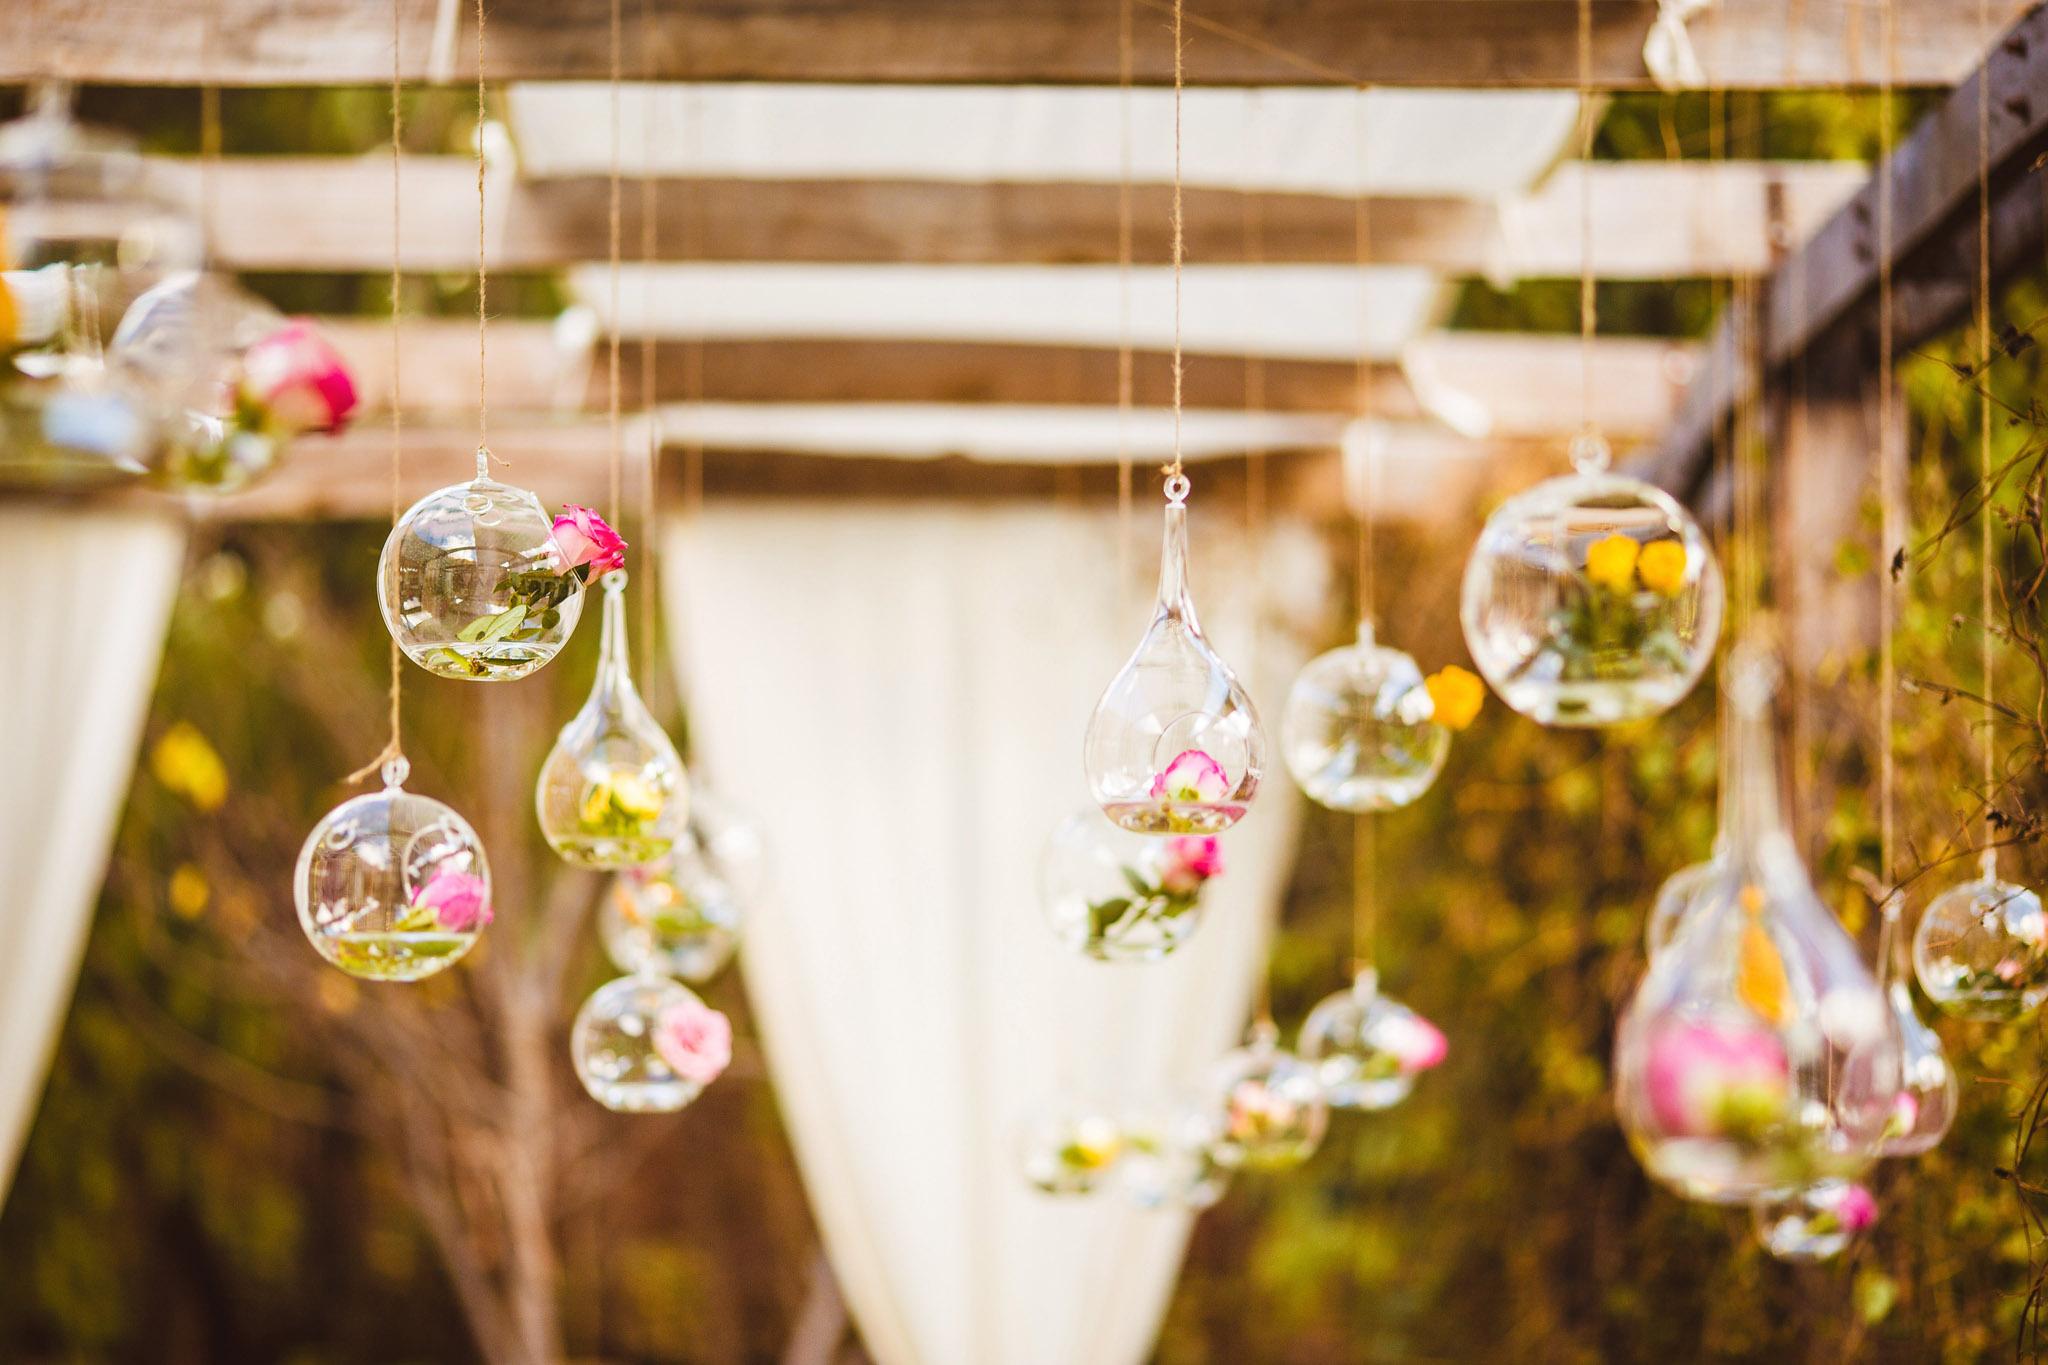 Wedding-Travellers-Destination-Wedding-Peru-Cusco-Hacienda-Sarapampa-Sacred-Valley-rose-decoration